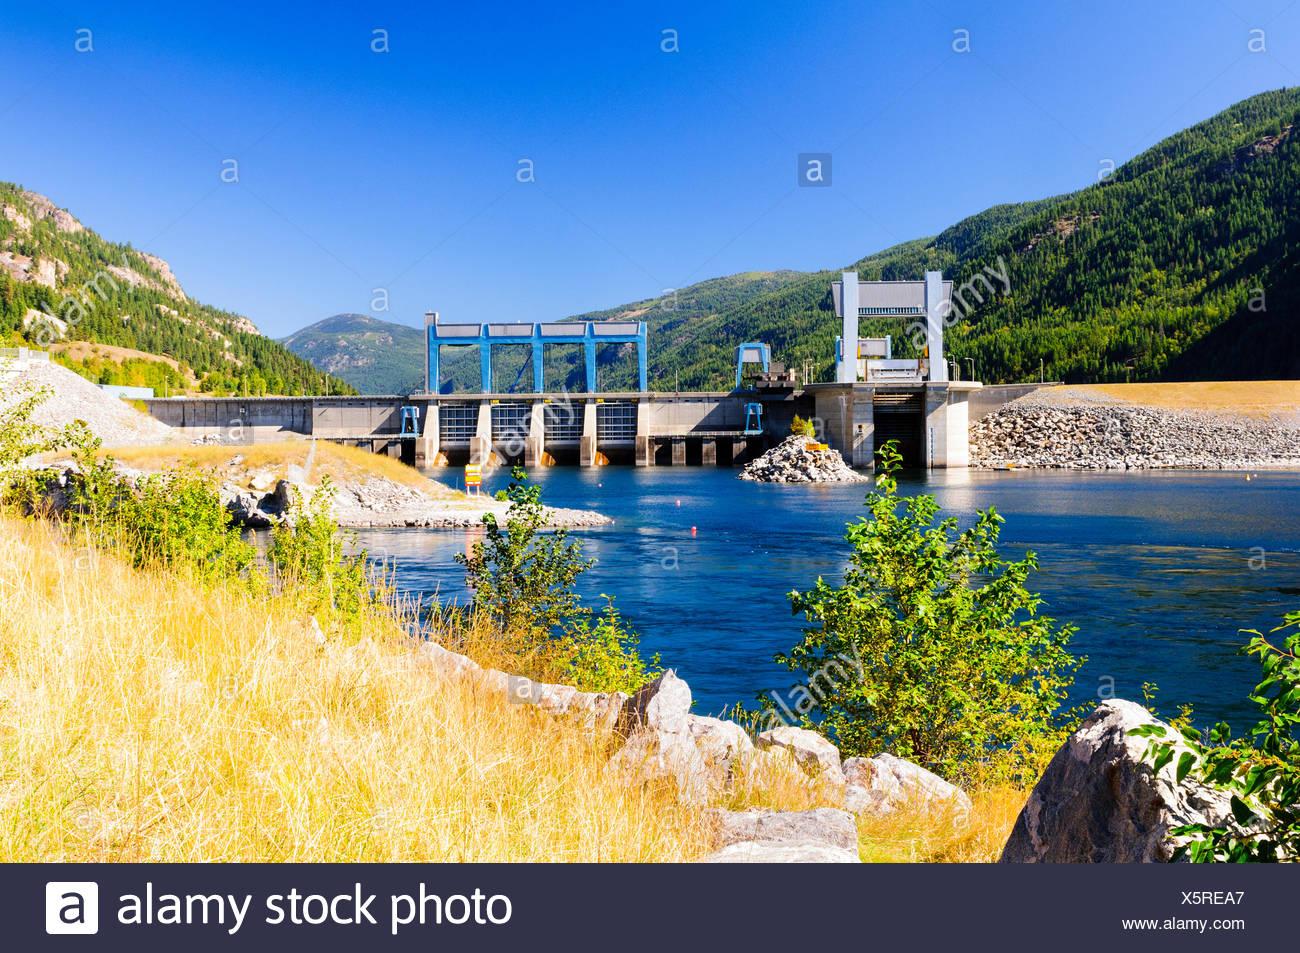 The Hugh Keenleyside Dam on the Columbia River near Castlegar, British Columbia. - Stock Image